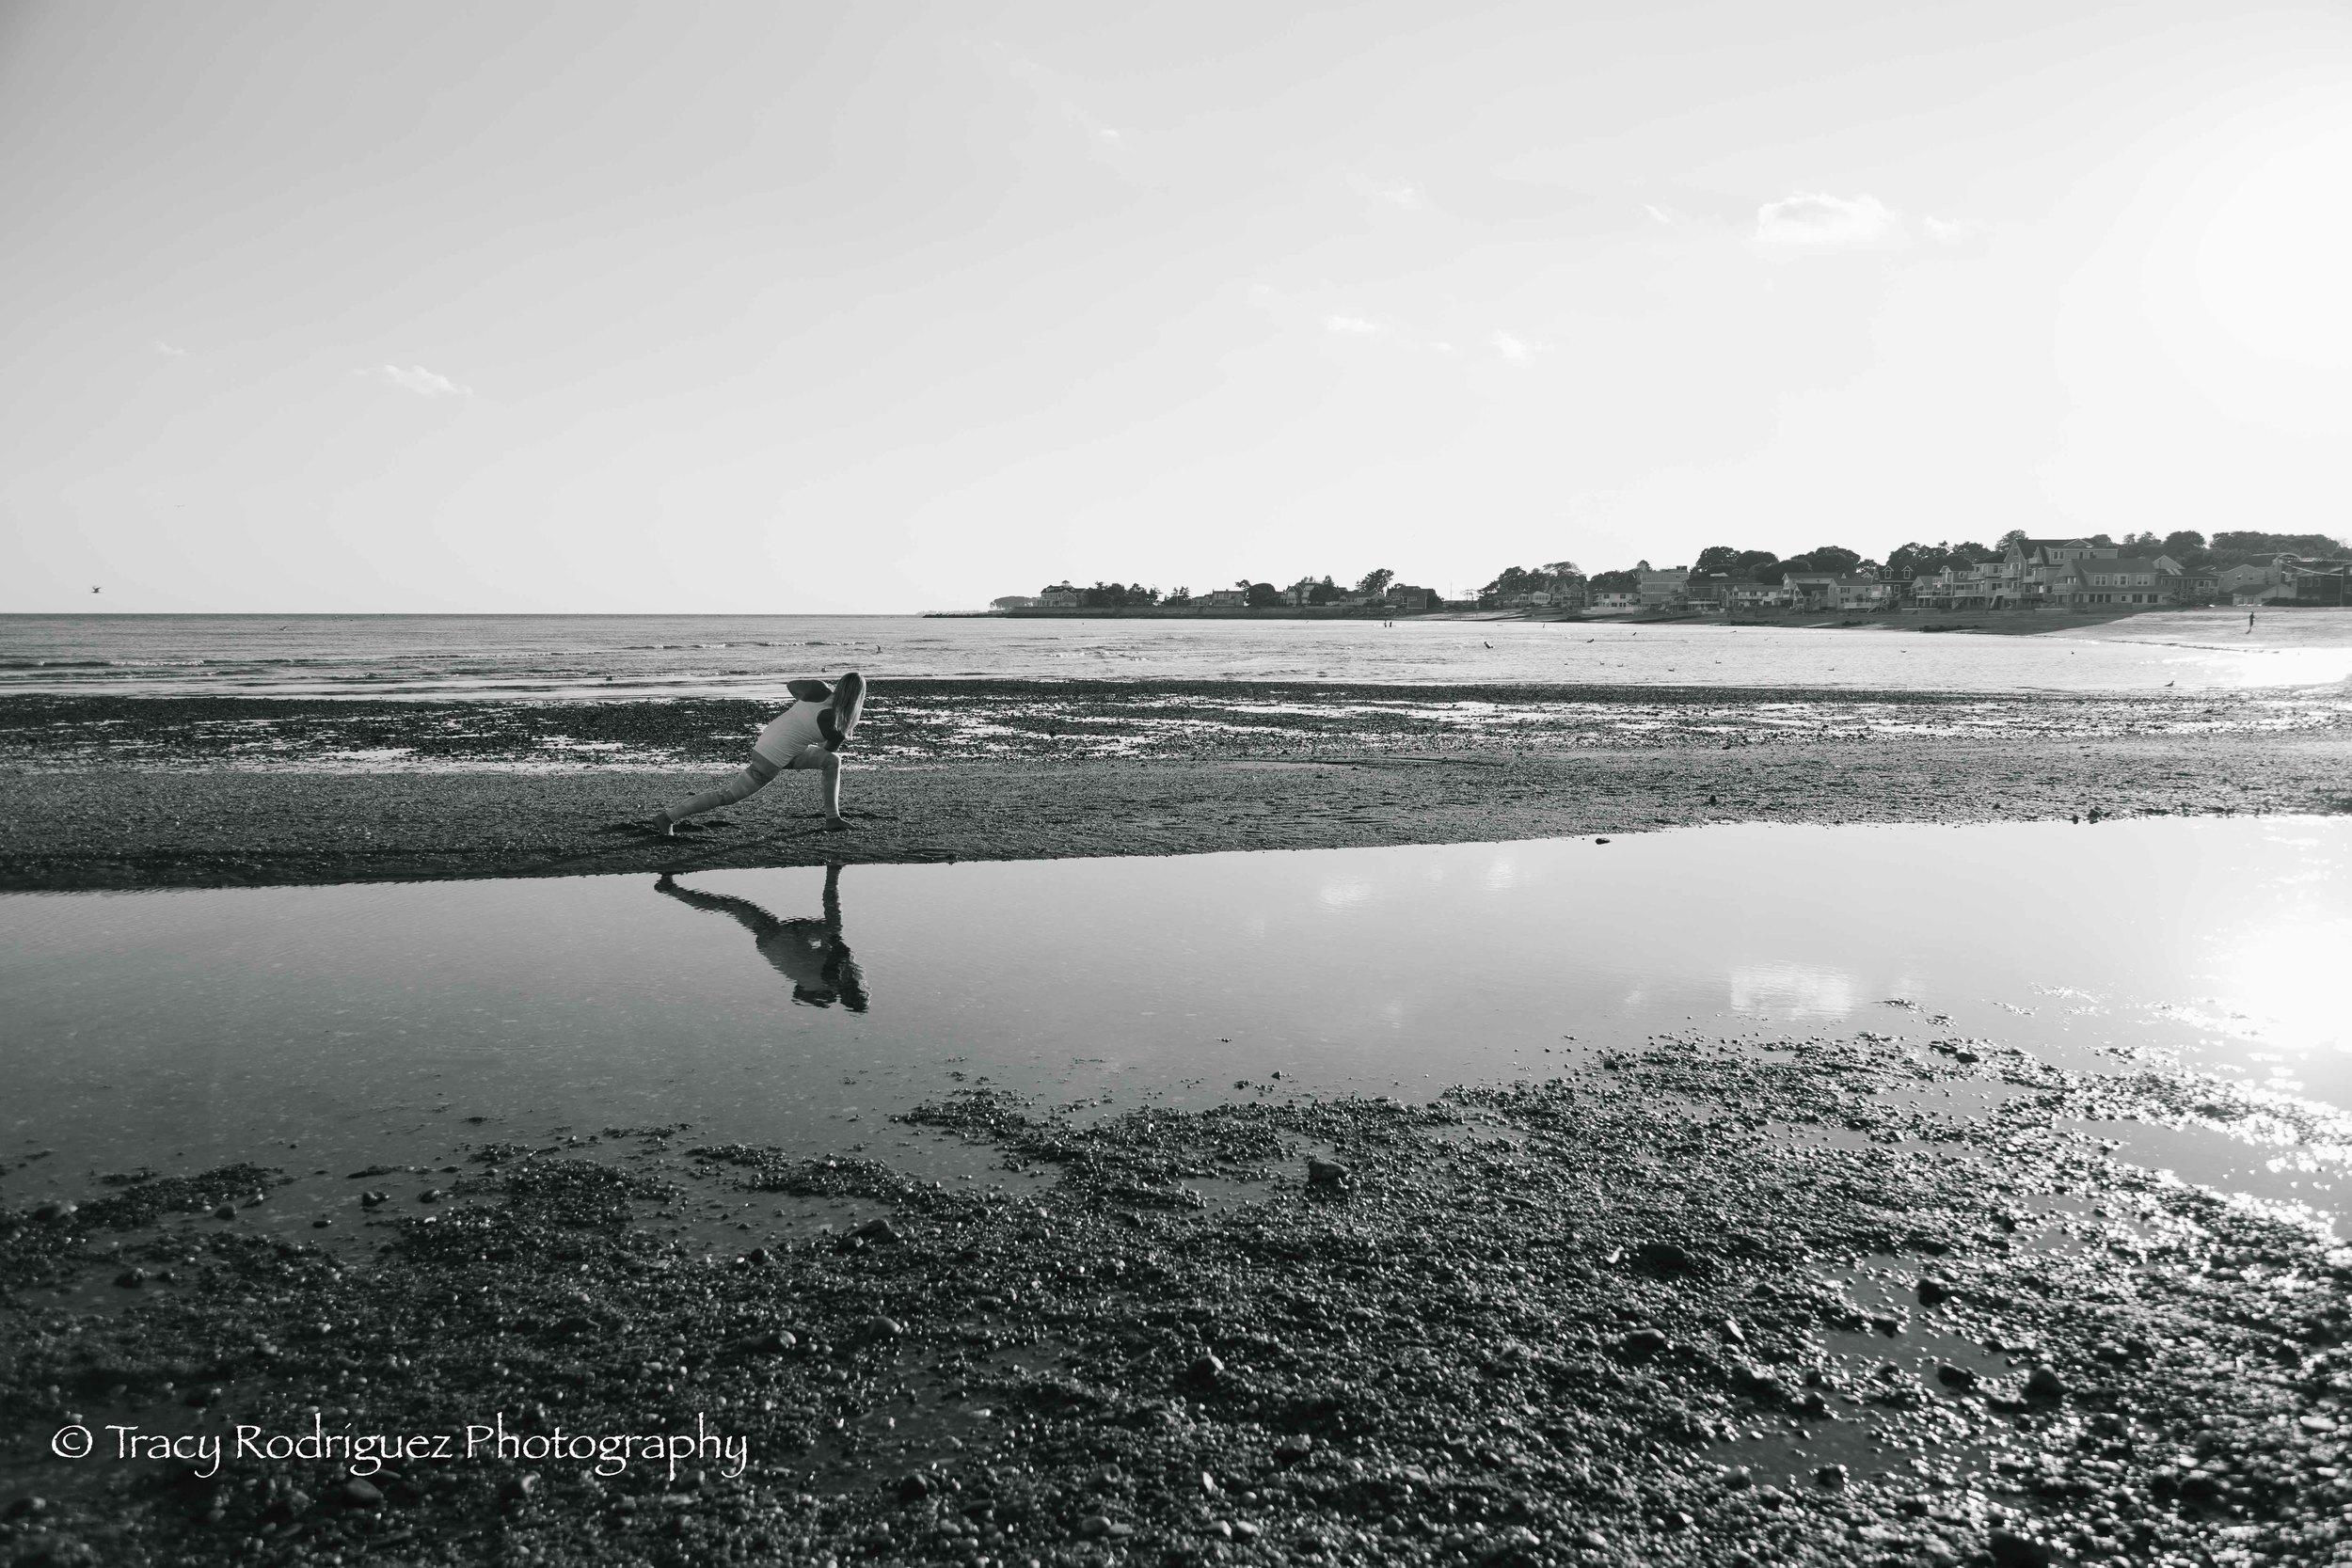 TracyRodriguezPhotography-CTyogaphotographer-5.jpg